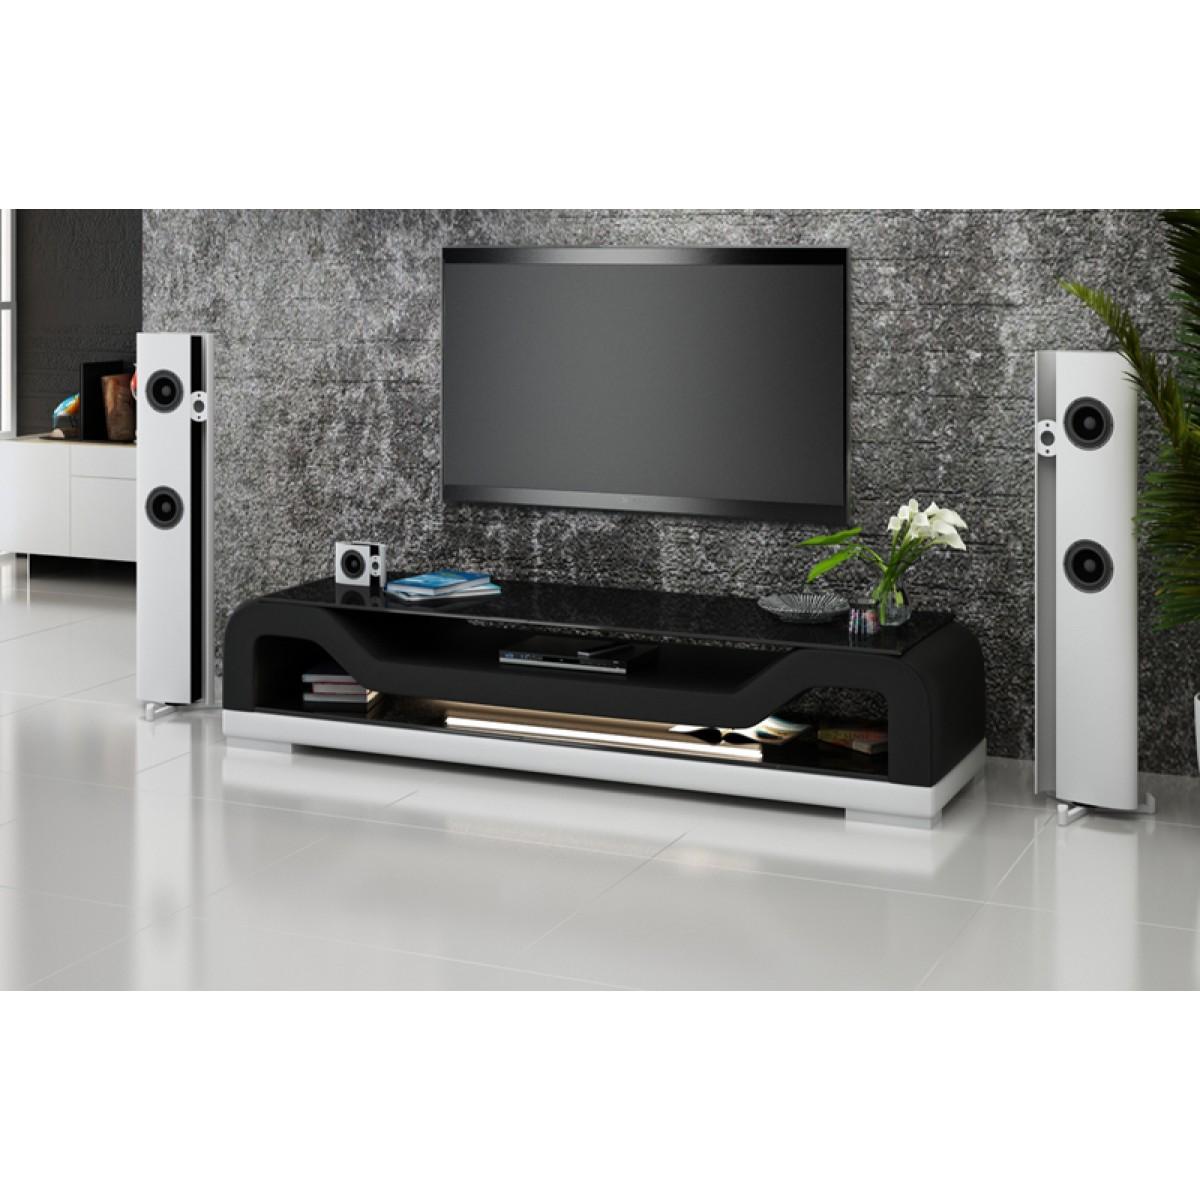 Meuble tv design personnalisable torino pop - Meuble personnalisable ...